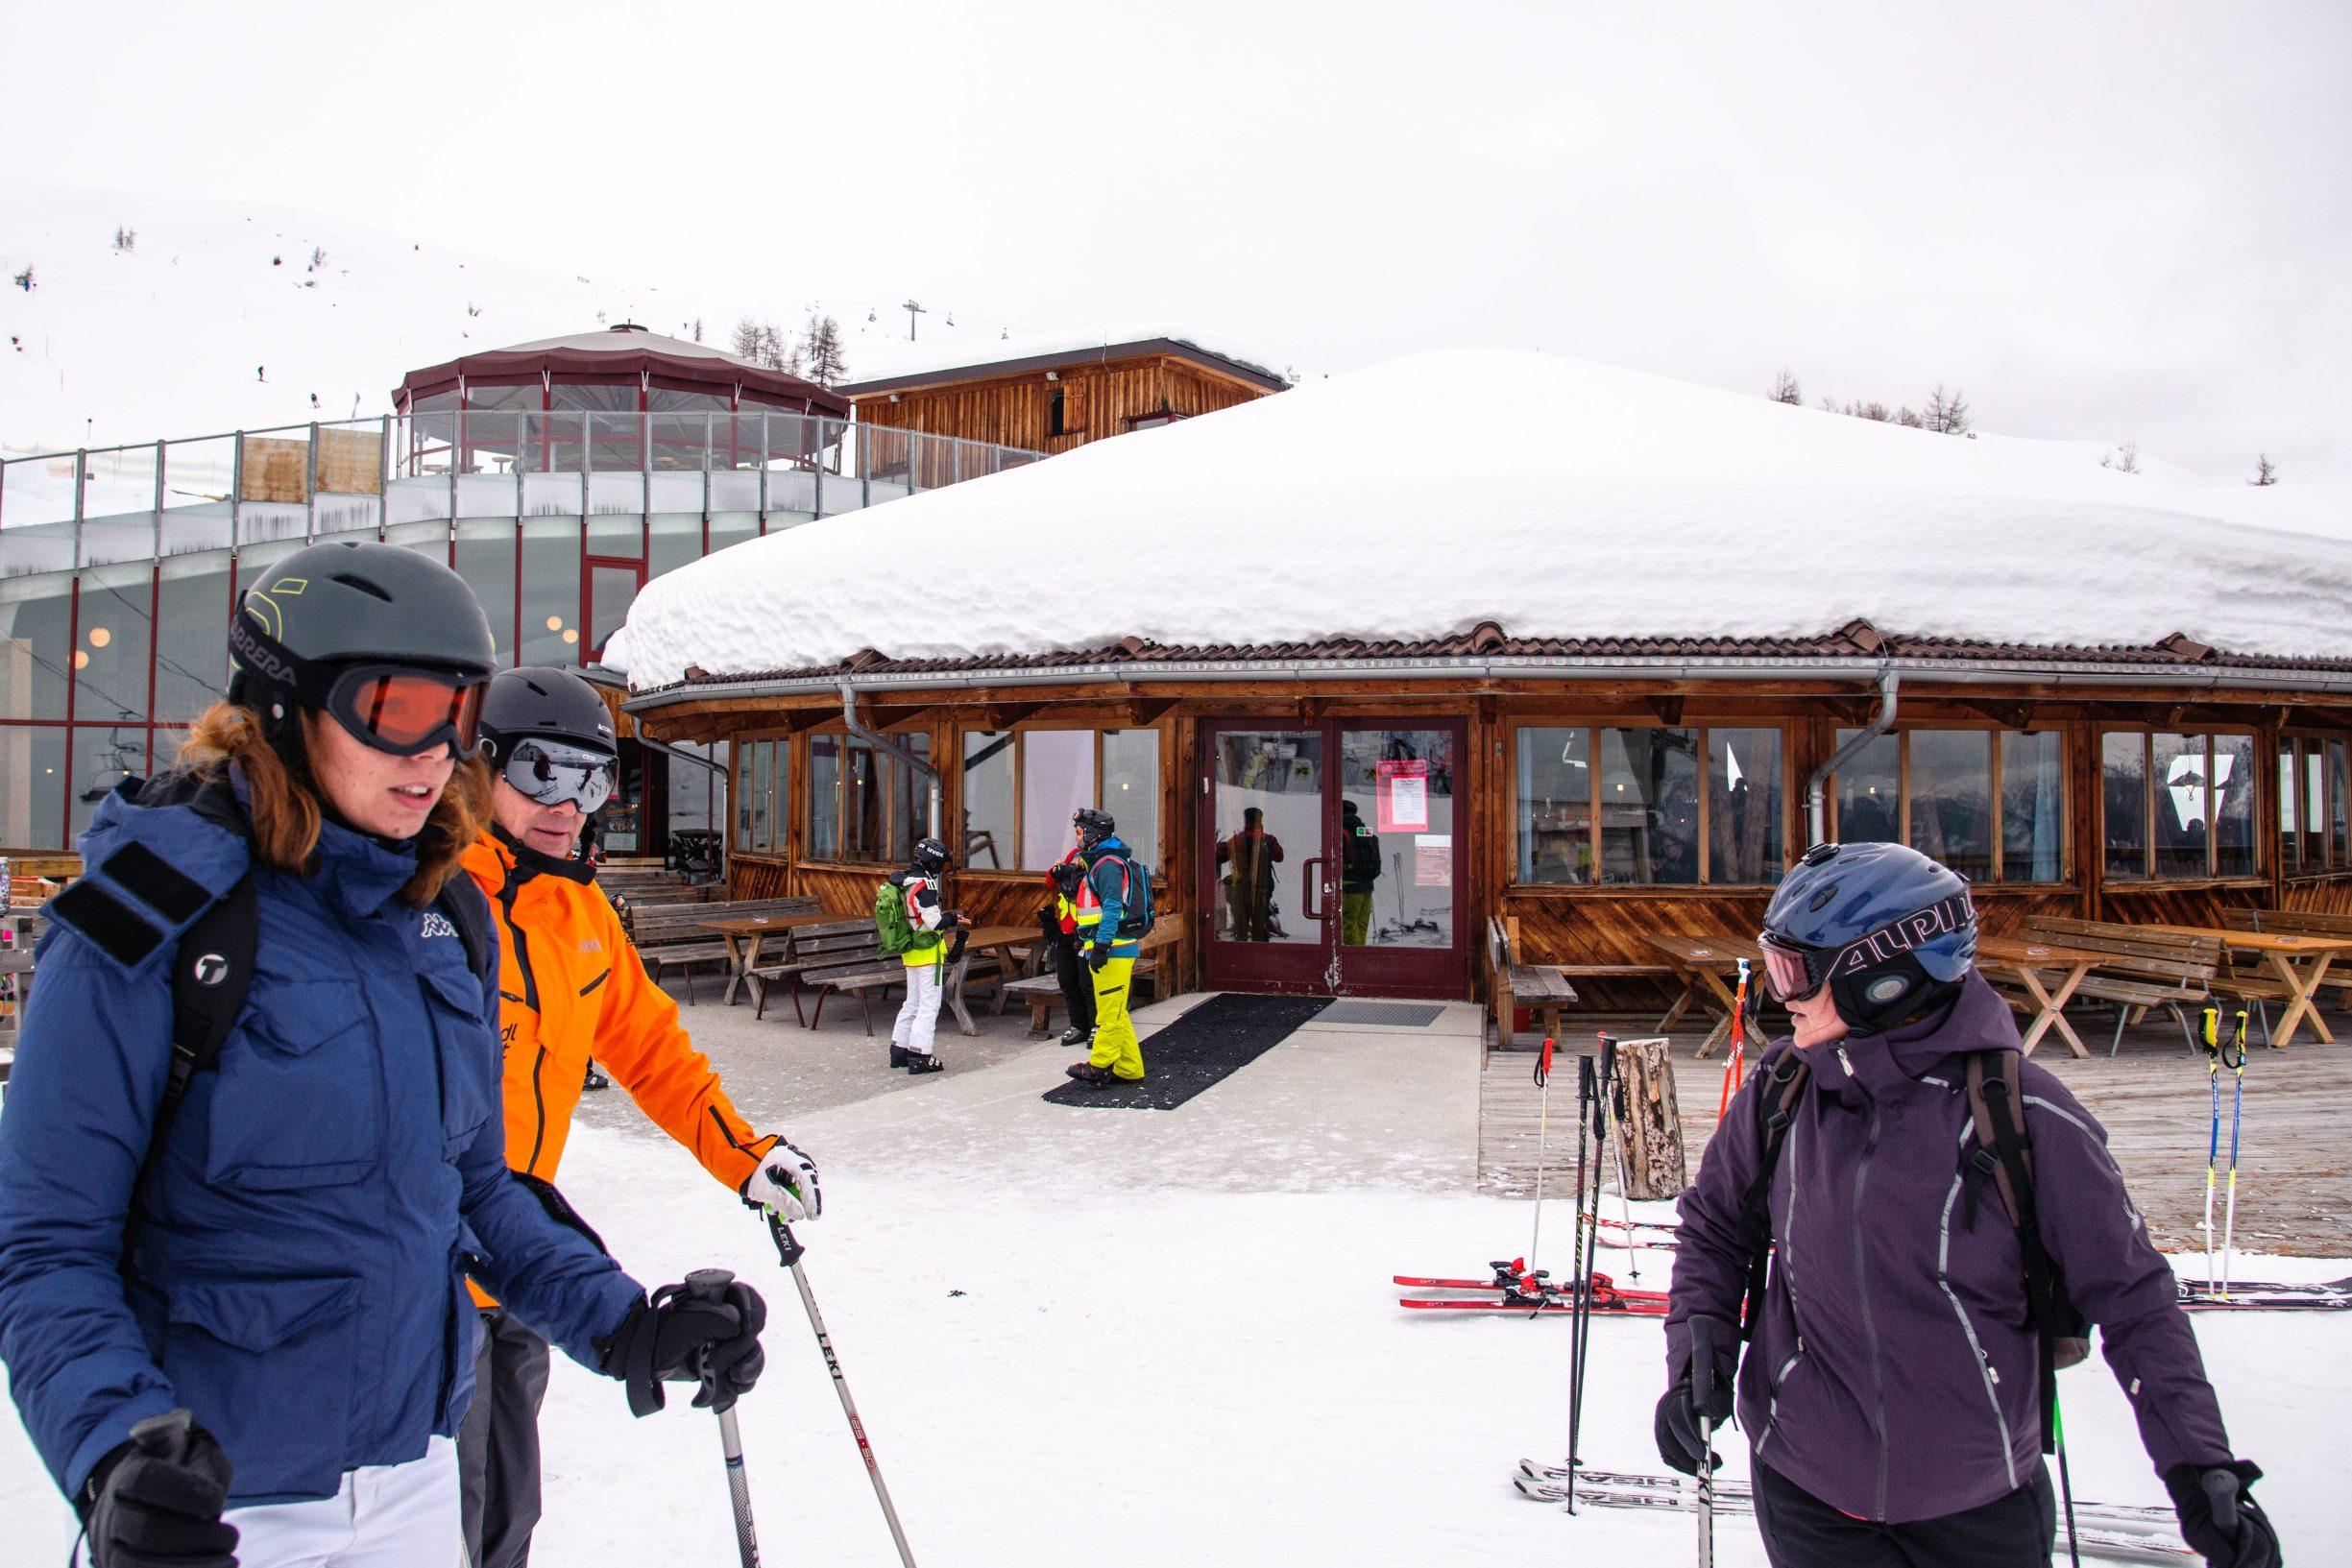 sillian_skijanje16-181219